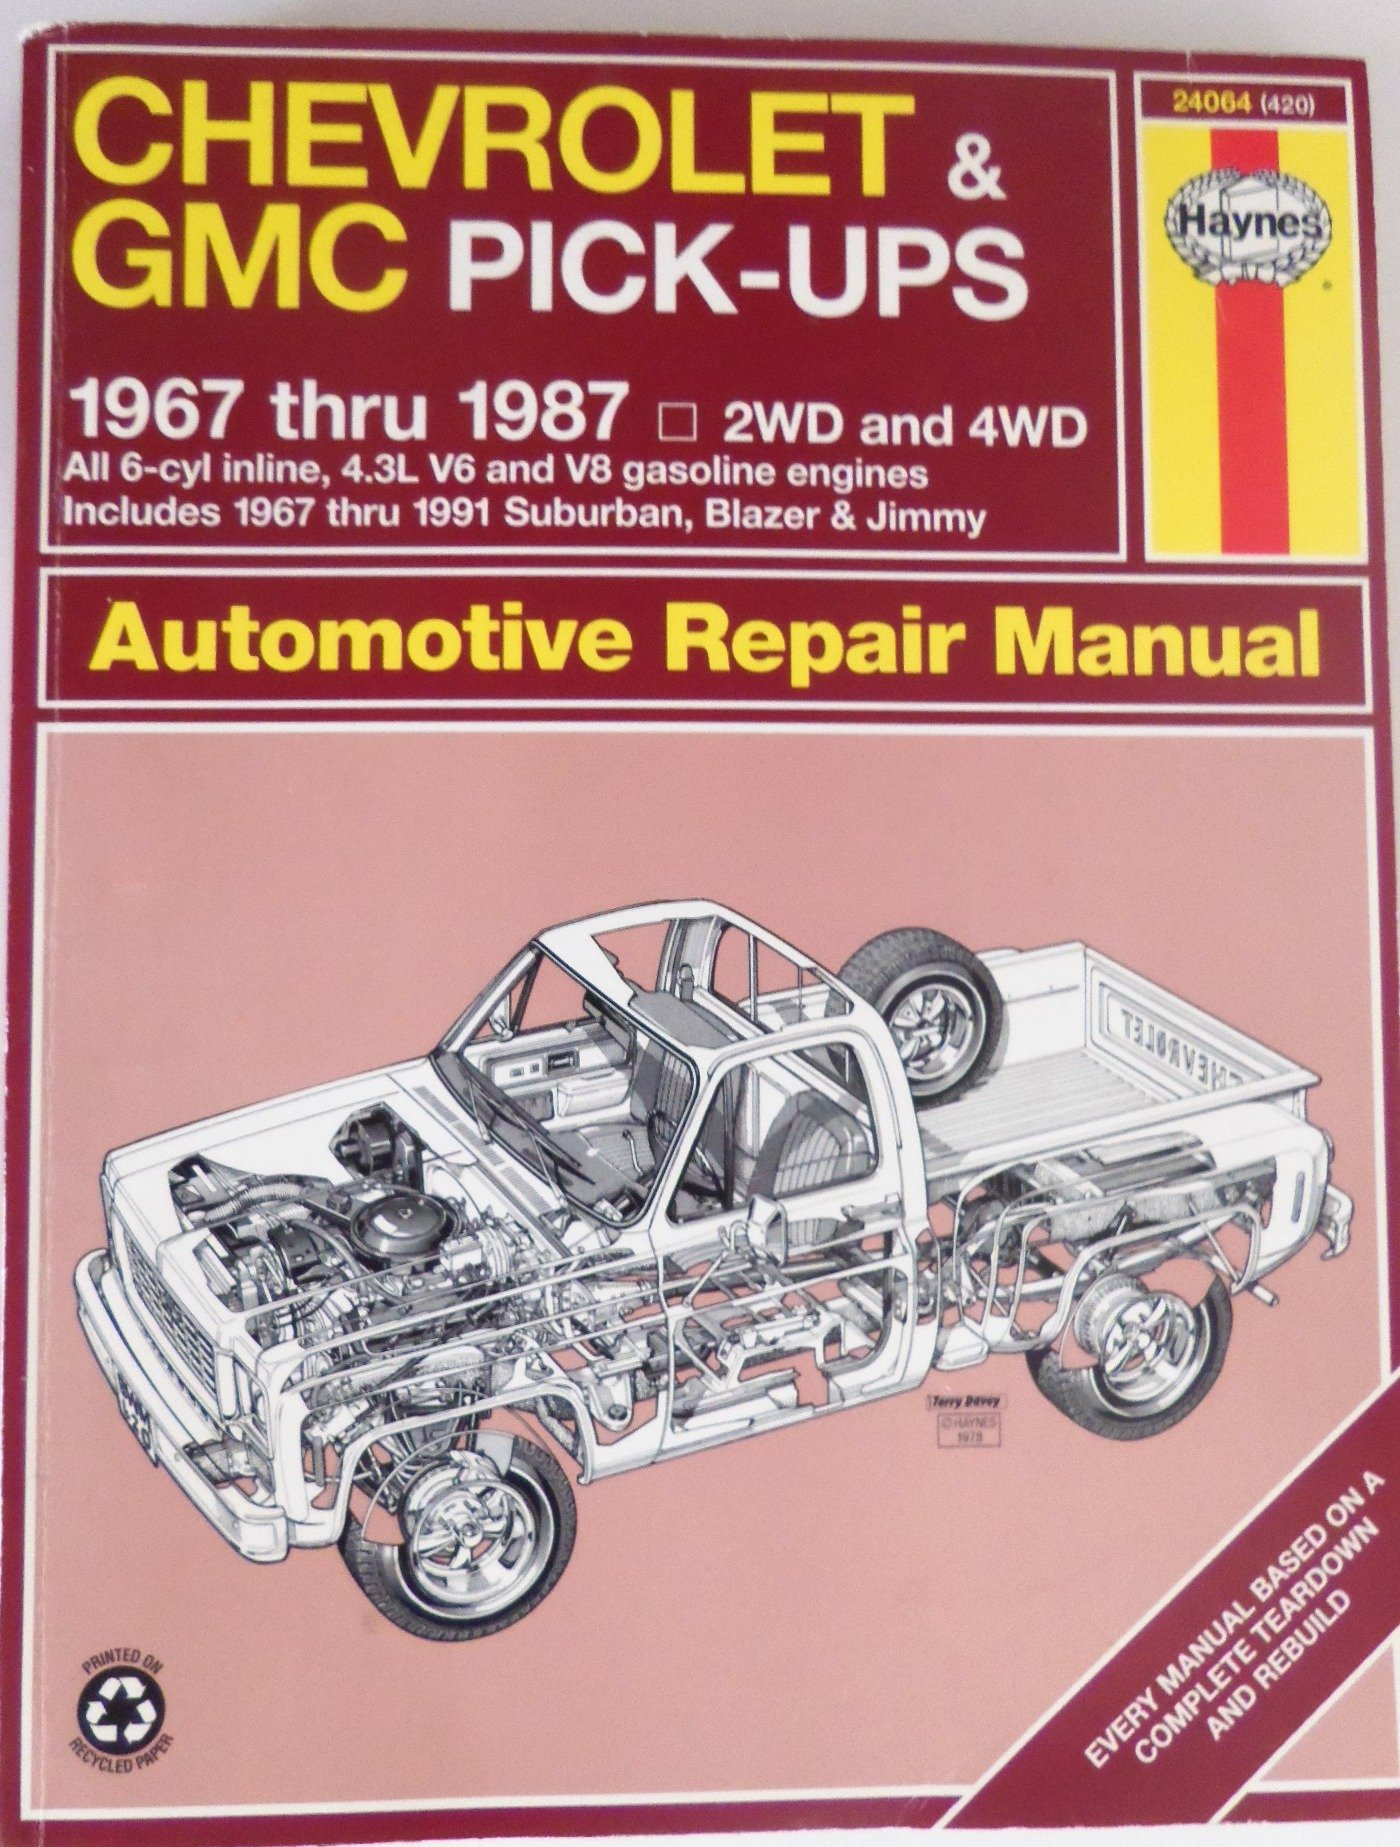 Chevrolet & Gmc Pick-Ups: 1967 Thru 1987, 2wd and 4wd, All 6-Cyl Inline,  4.3l V6 and V8 Gasoline Engines Includes 1967 Thru 1991 Suburban, Blazer &  Jimmy ...